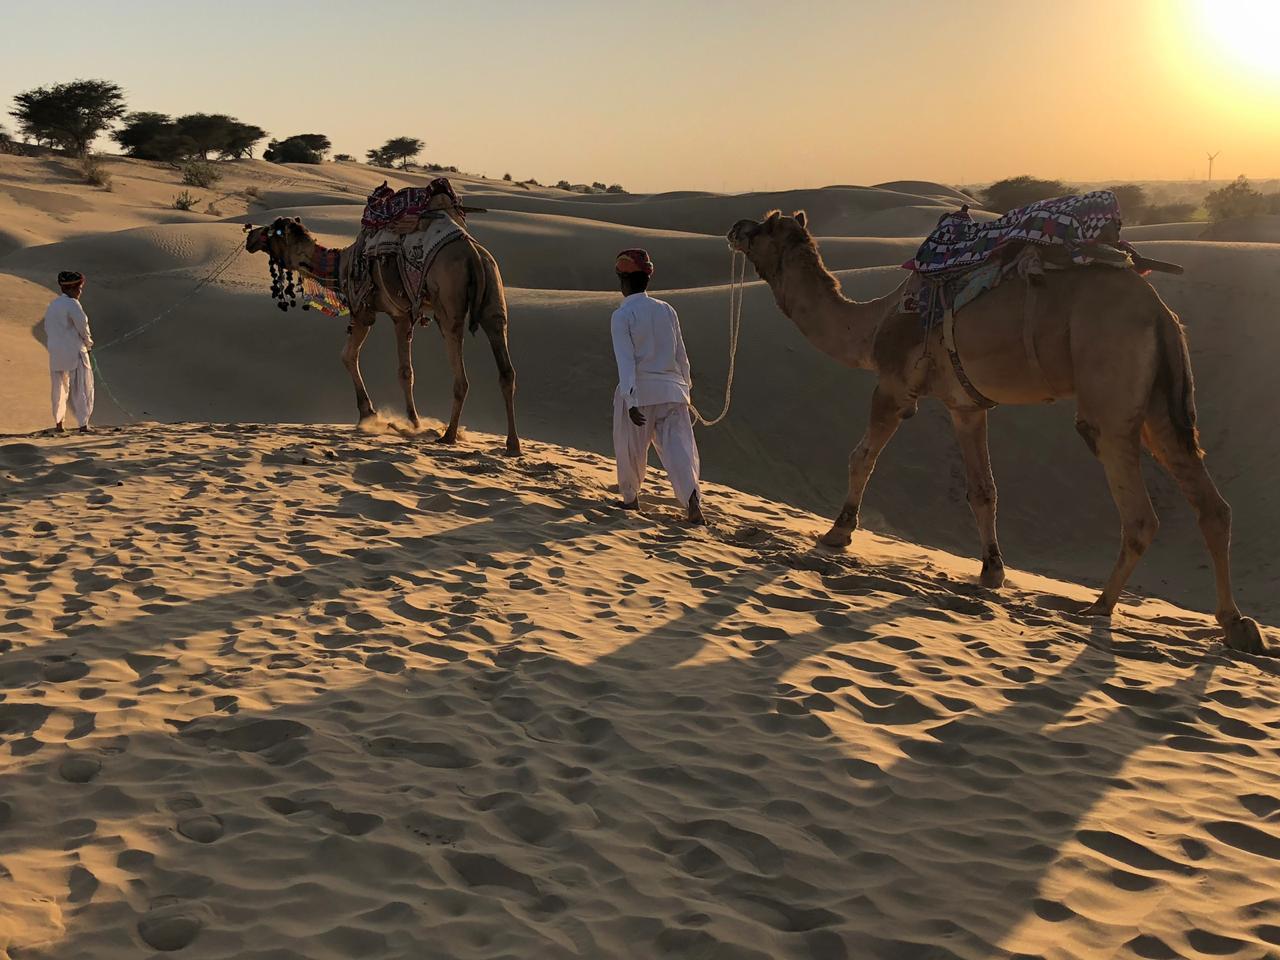 Camel ride at serai, serai sujan jaisalmer, sujan the serai jaisalmer, the serai jaisalmer, The Serai Sujan,